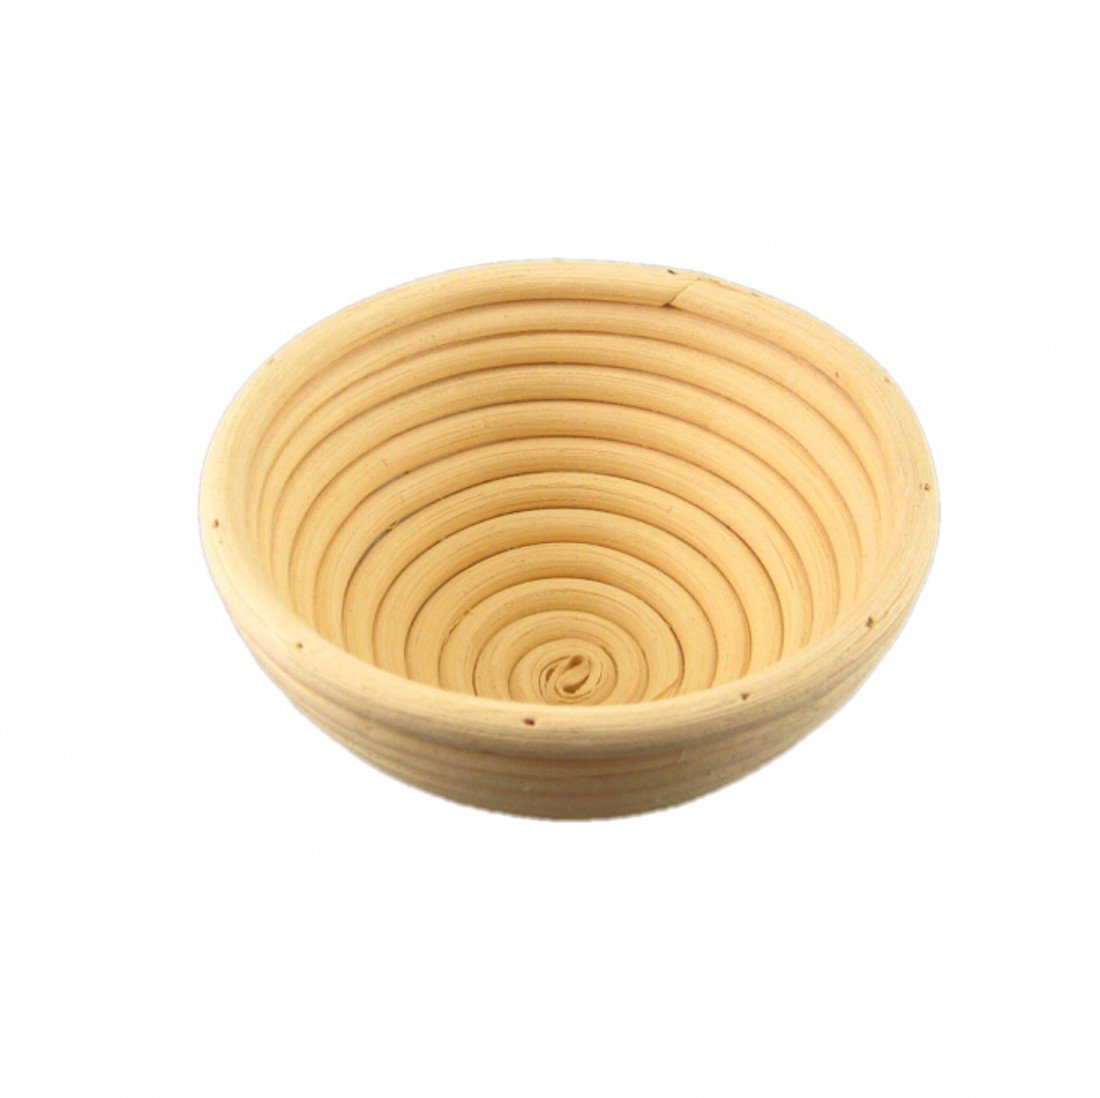 CHENGYIDA 10PCS 5''(13cm) Small Round Rattan Banneton Brotform Bread Proofing Proving Basket